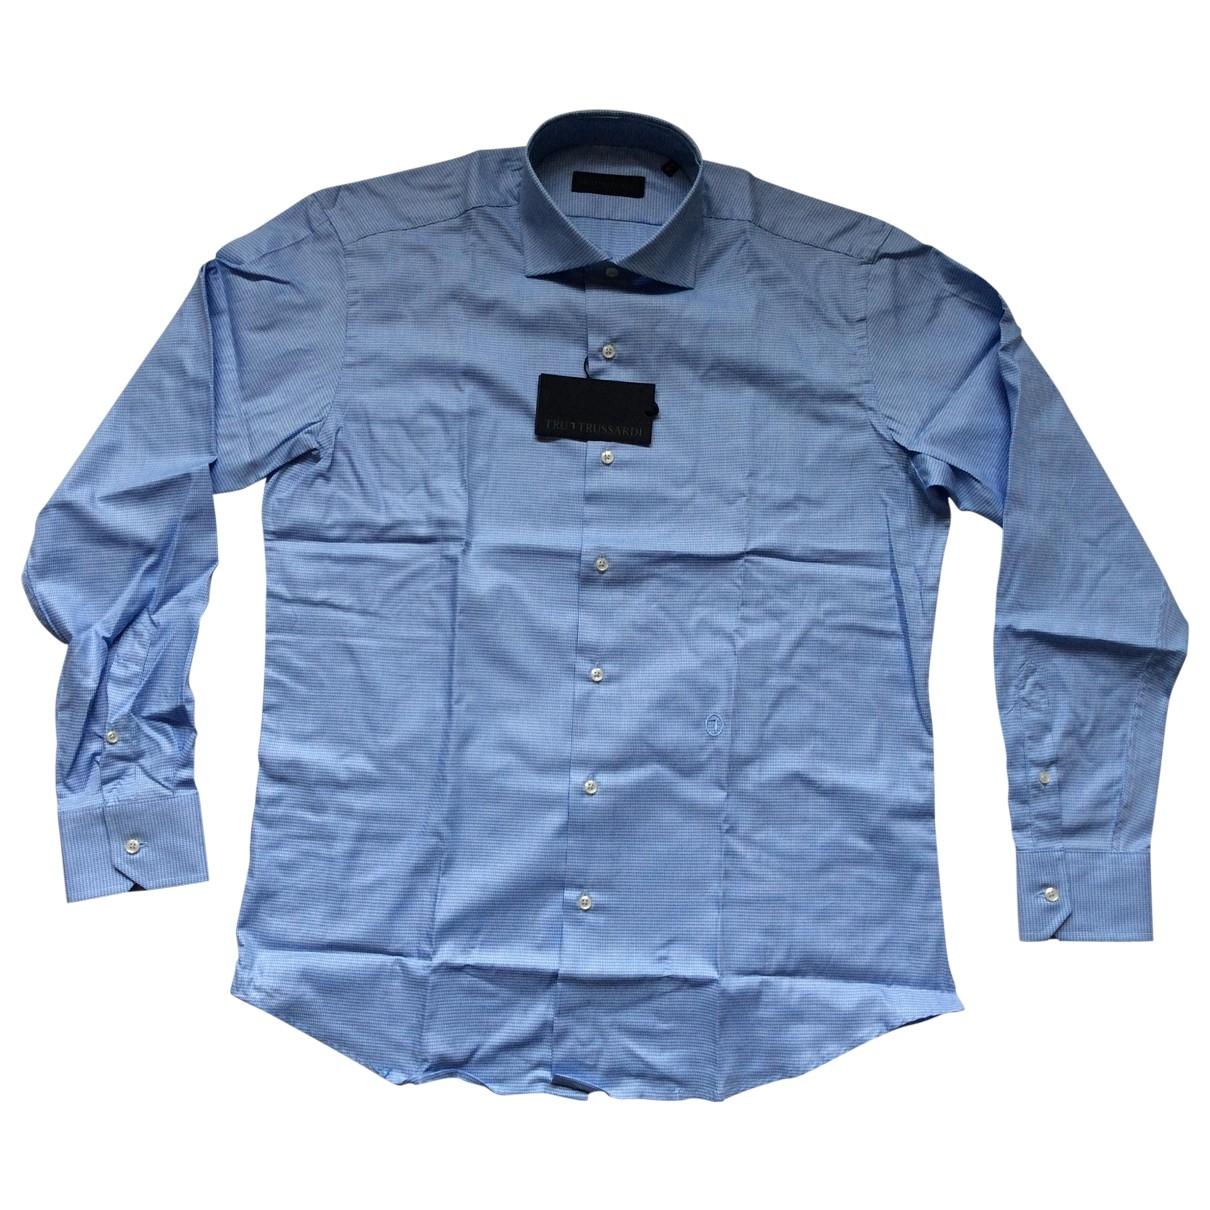 Trussardi \N Blue Cotton Shirts for Men 41 EU (tour de cou / collar)